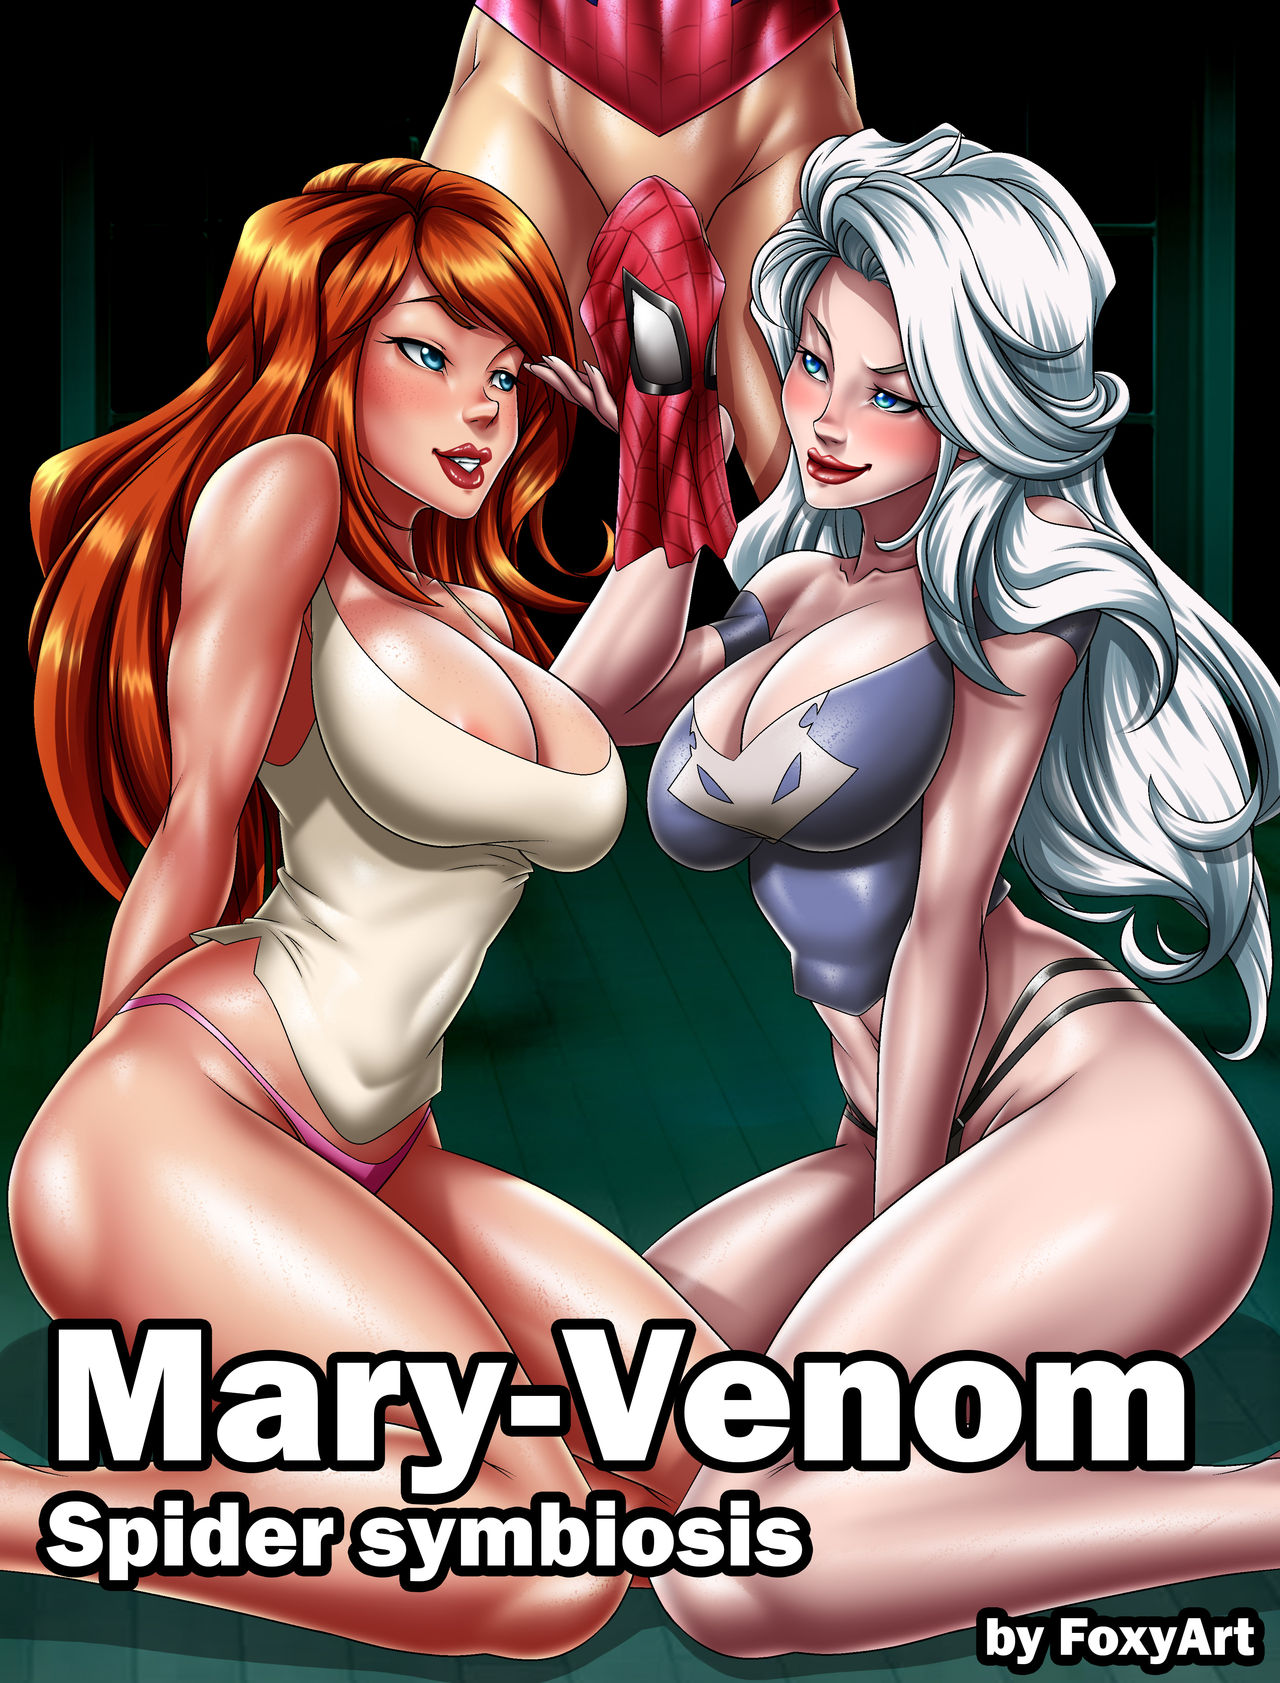 Mary-Venom Spider Symbiosis